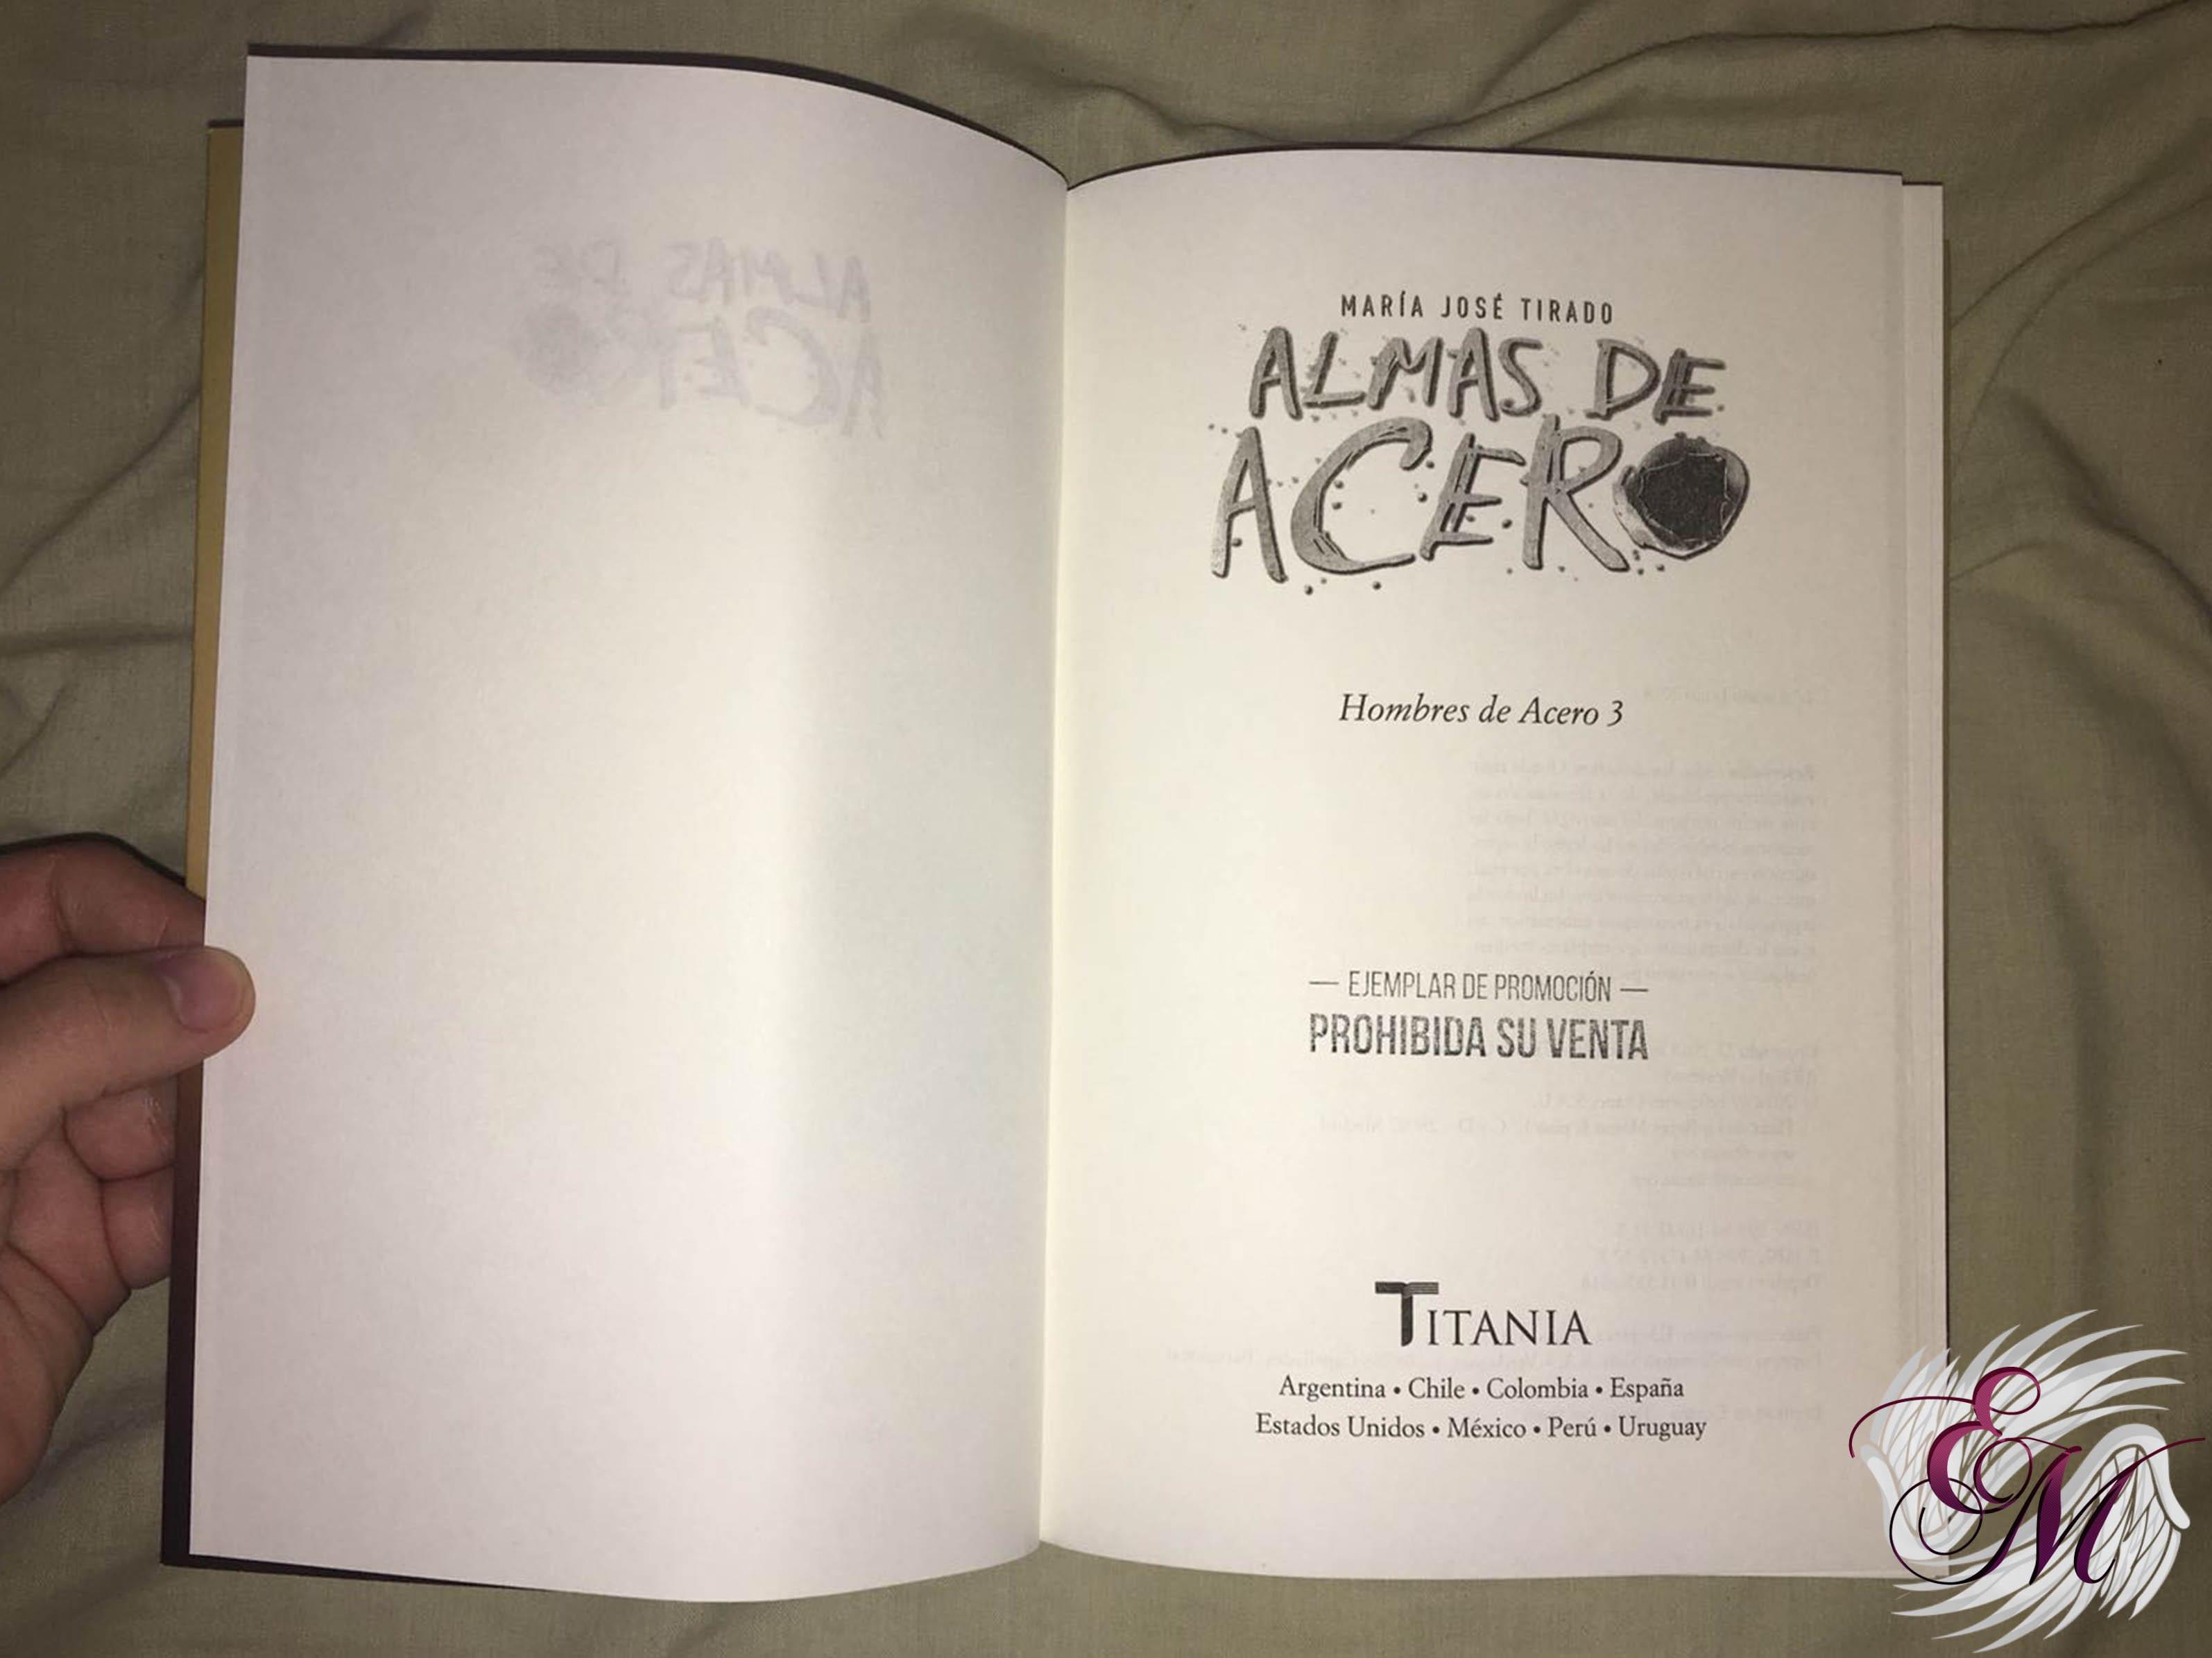 Almas de acero, de María José Tirado - Reseña